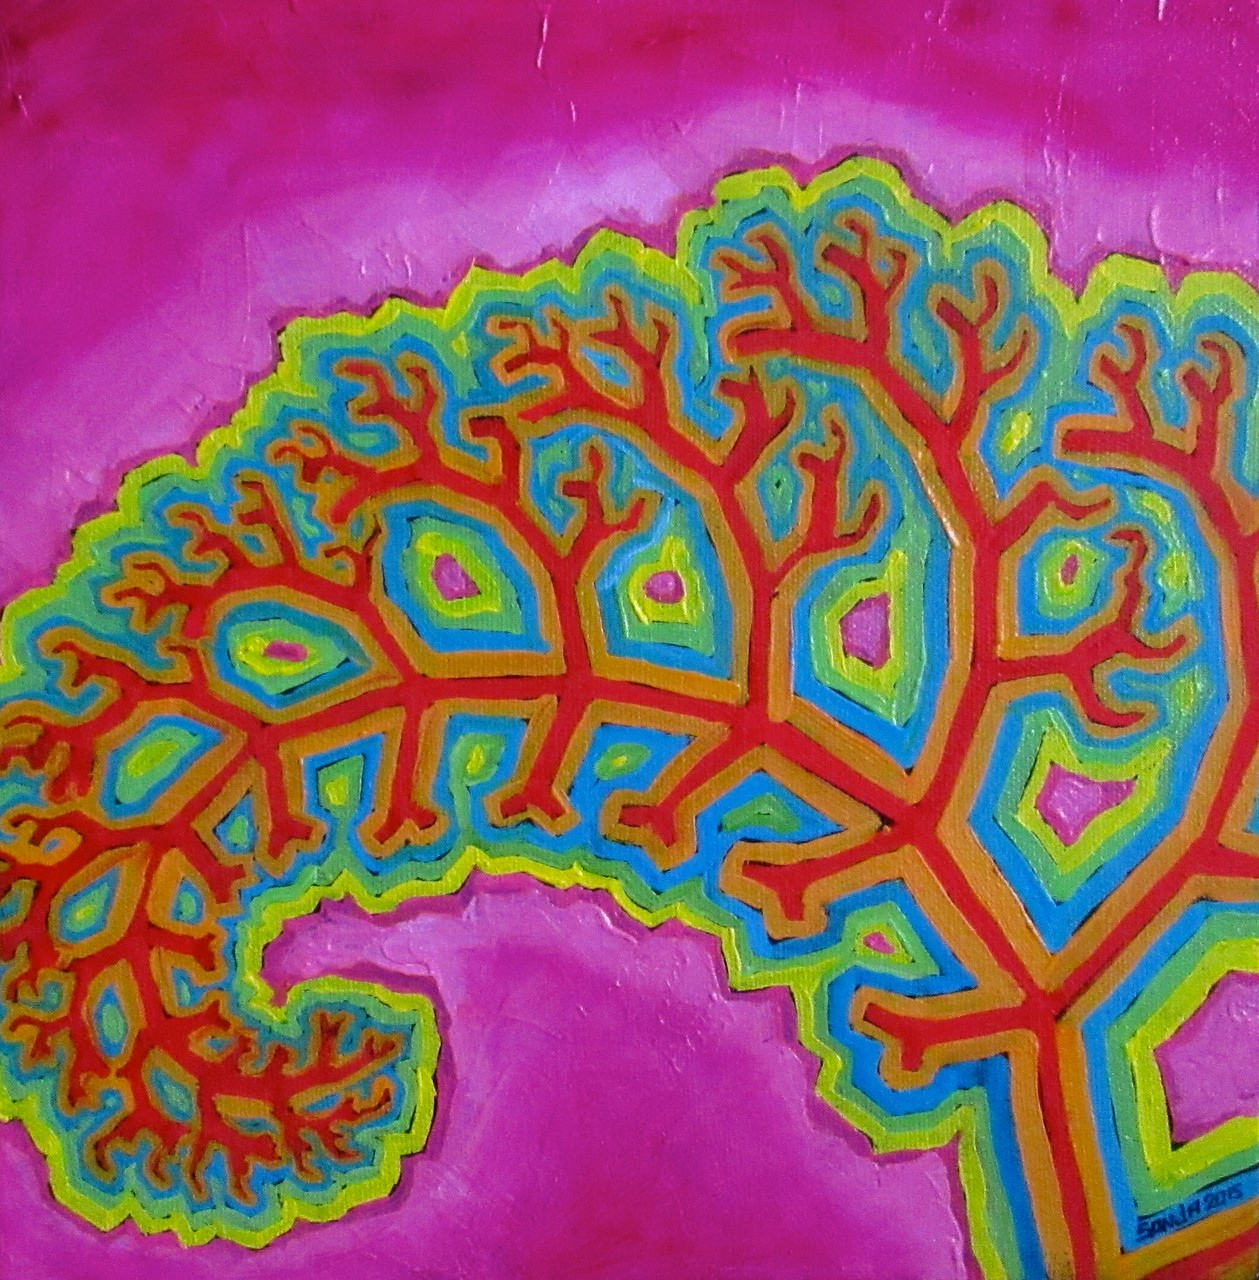 """Fractal Curl"", oil on canvas 10x10, Feb.2016 - (1/2)"